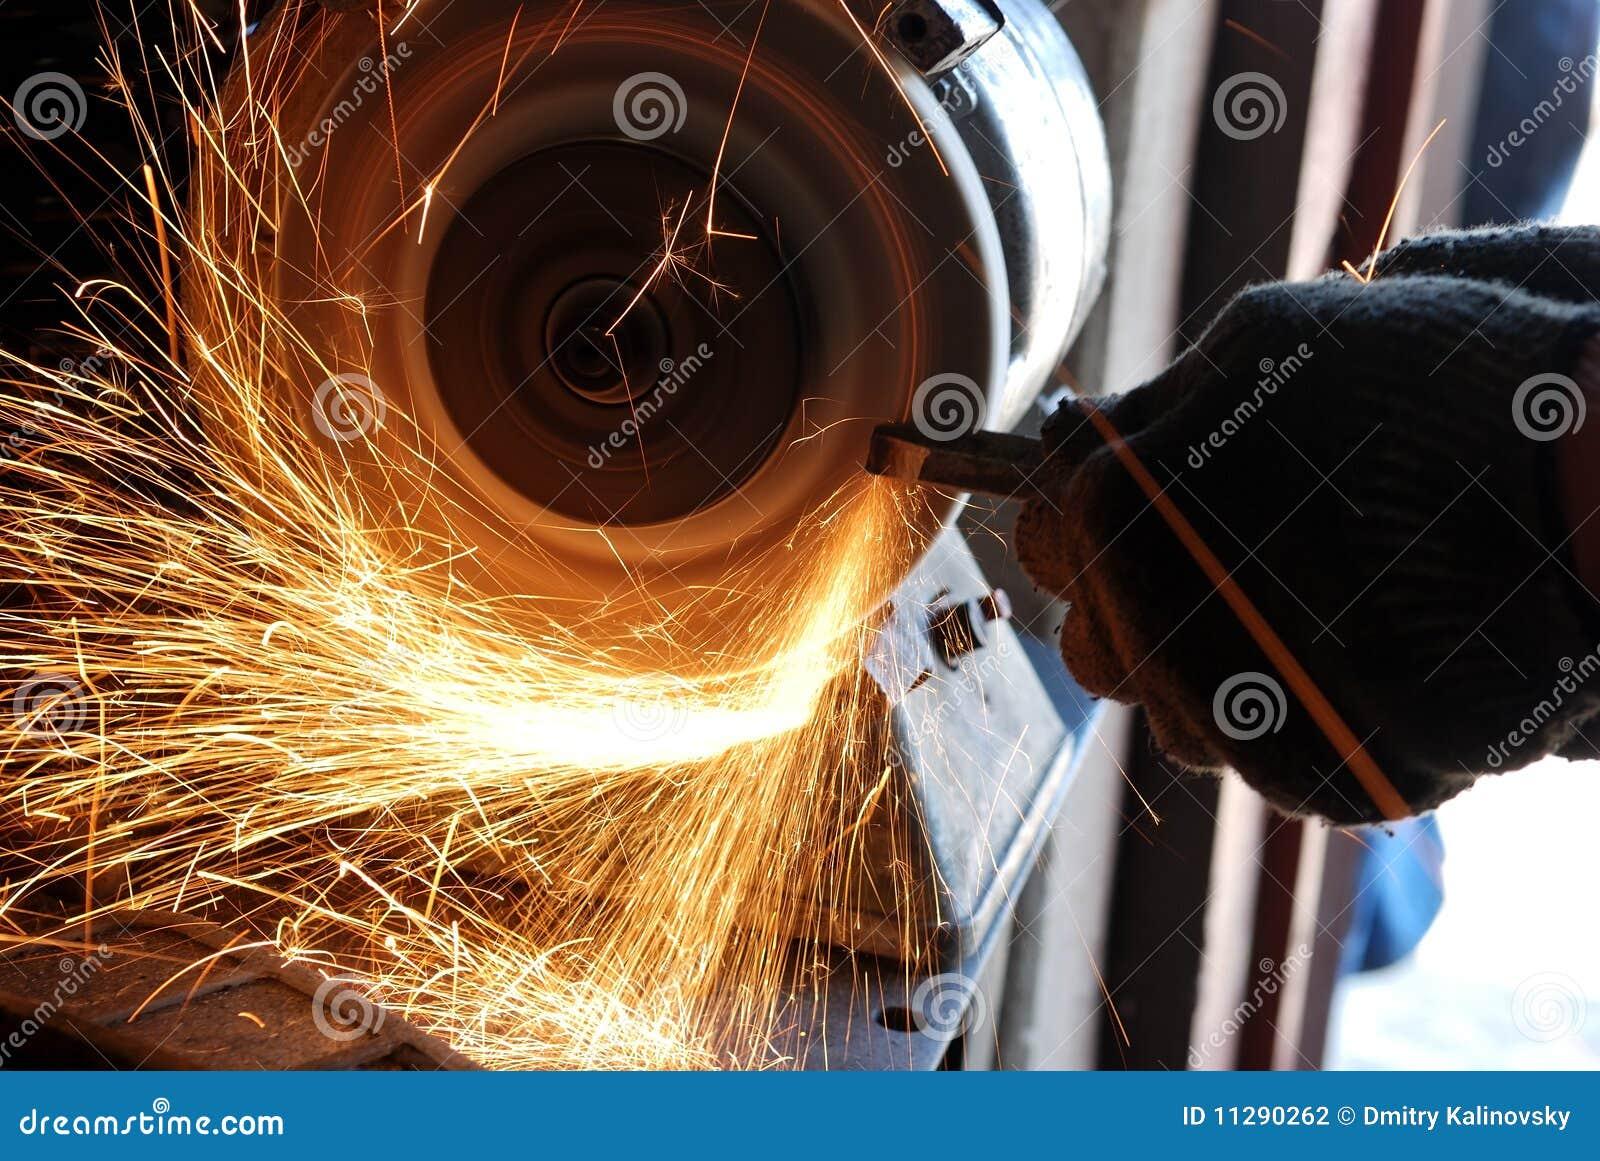 Locksmith grinding